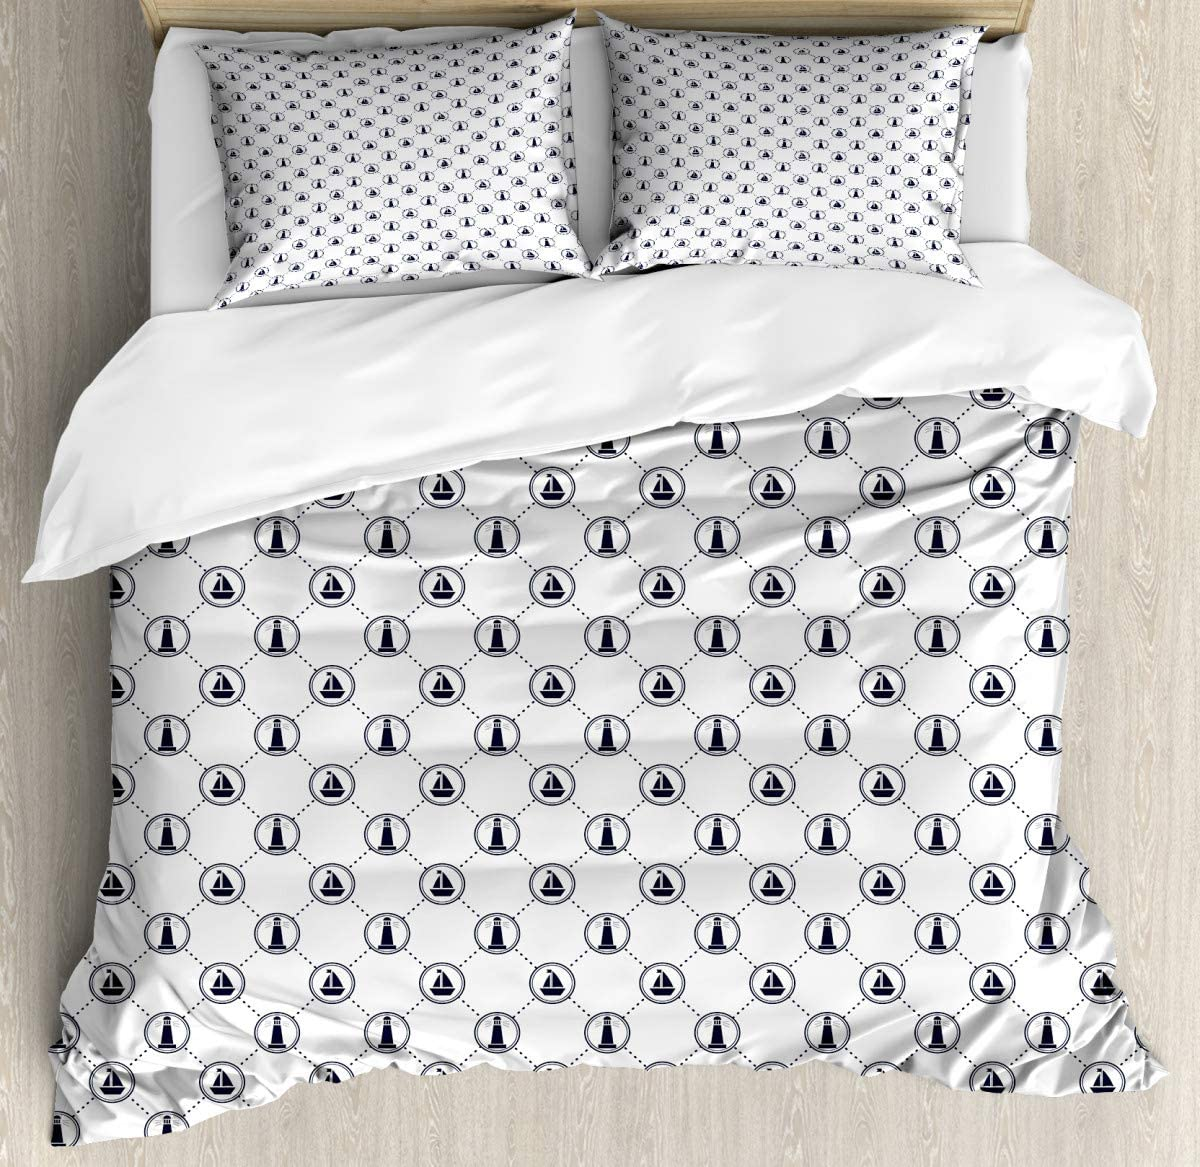 "Bedding Set Maritime Circles Dot Duvet Cover Set1 Duvet Cover + 2 Pillow Shams70 x86/19""x29""inch"